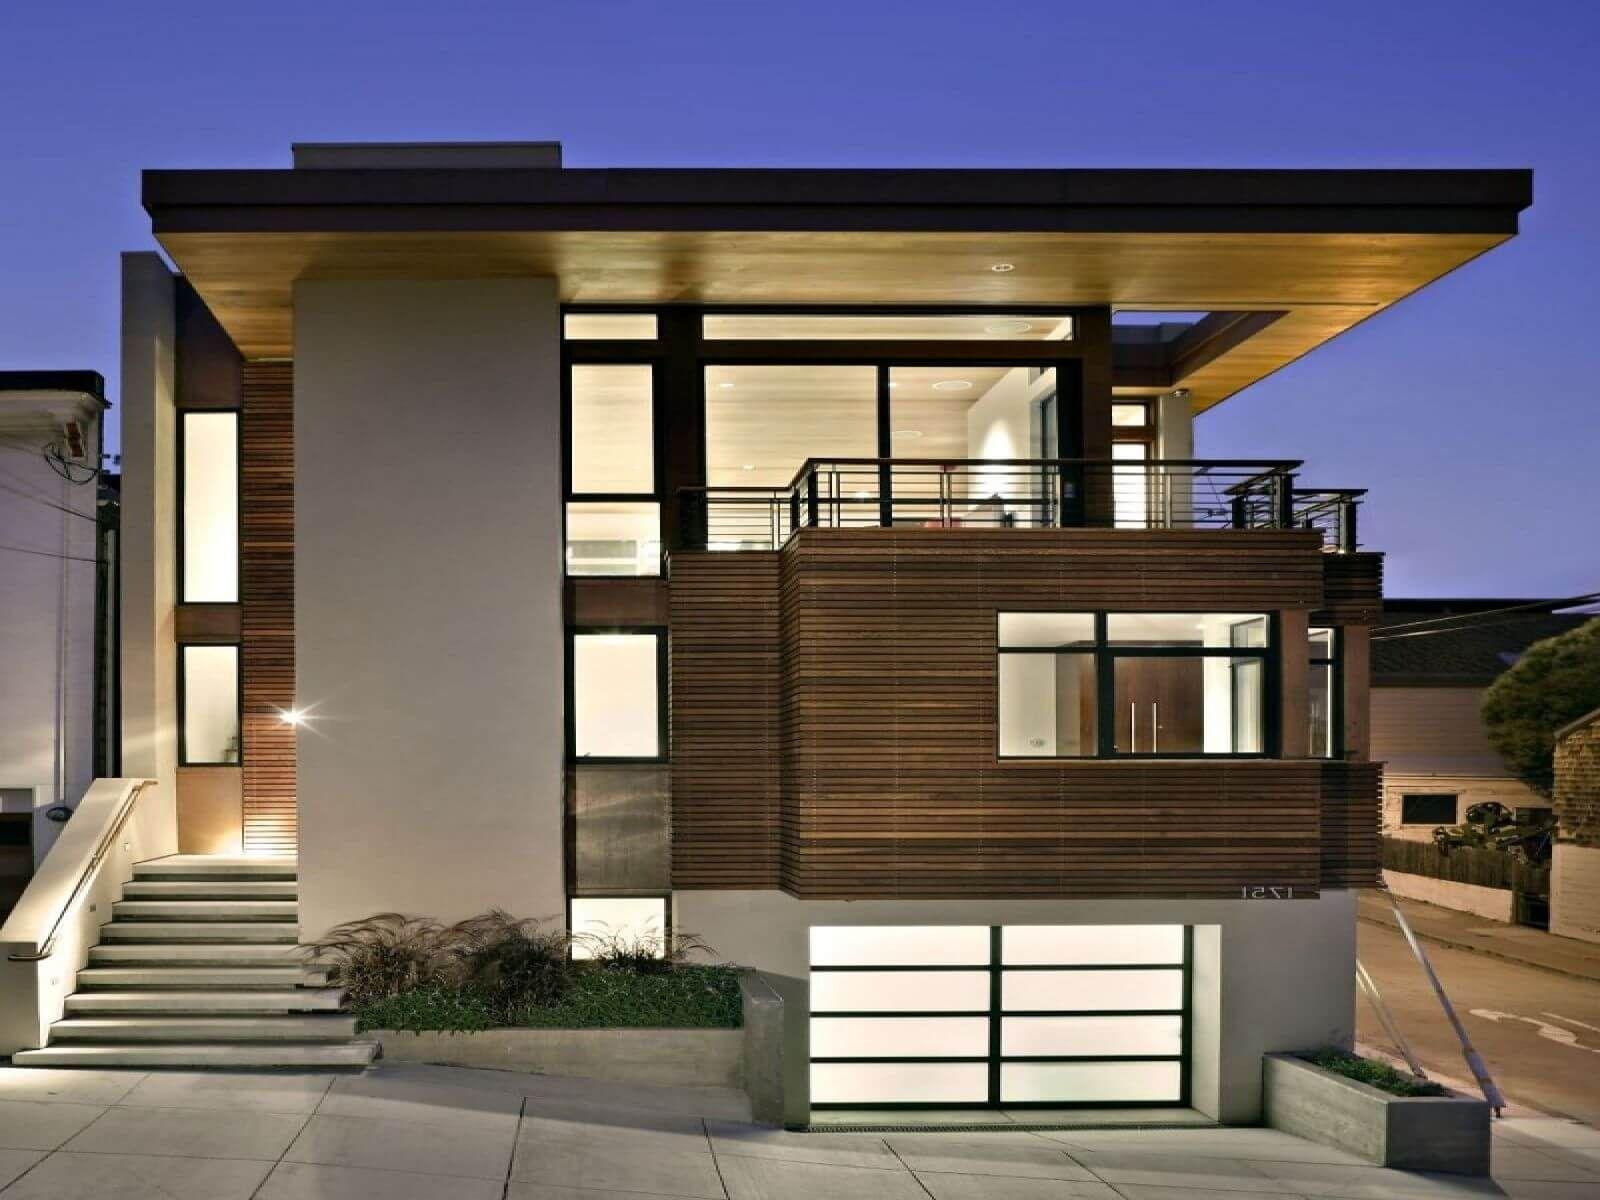 Factors to Keep in Mind For Best Modern Villa Design